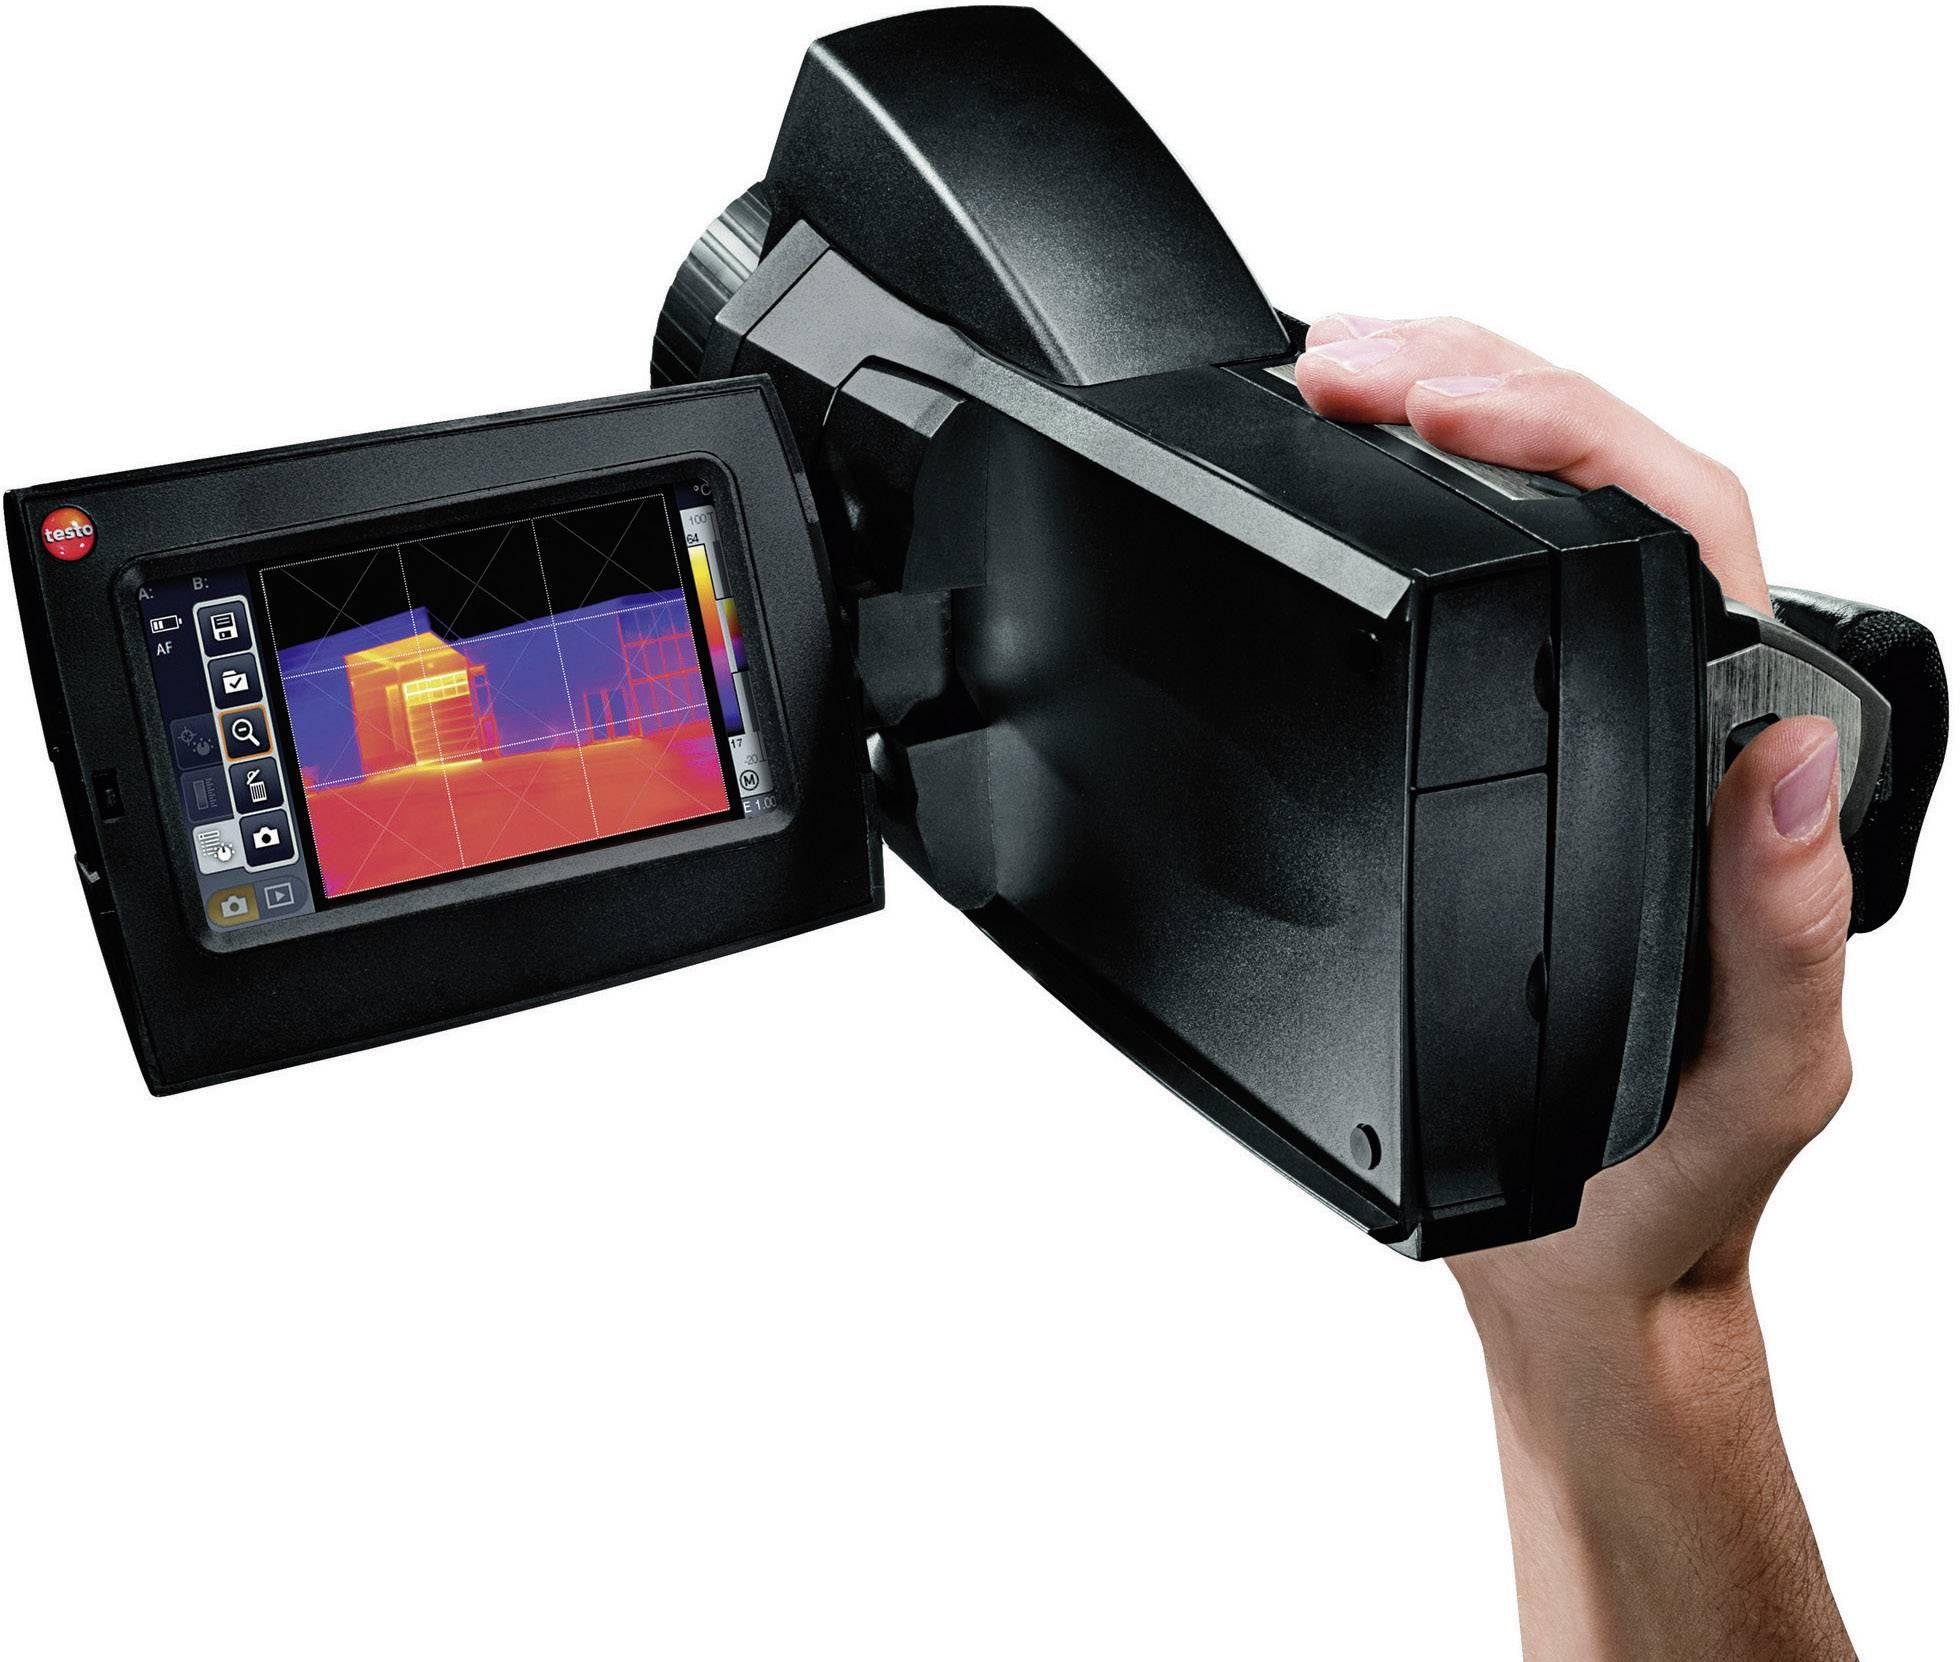 Termálna kamera testo 885-1 0563 0885 V1, 320 x 240 pix